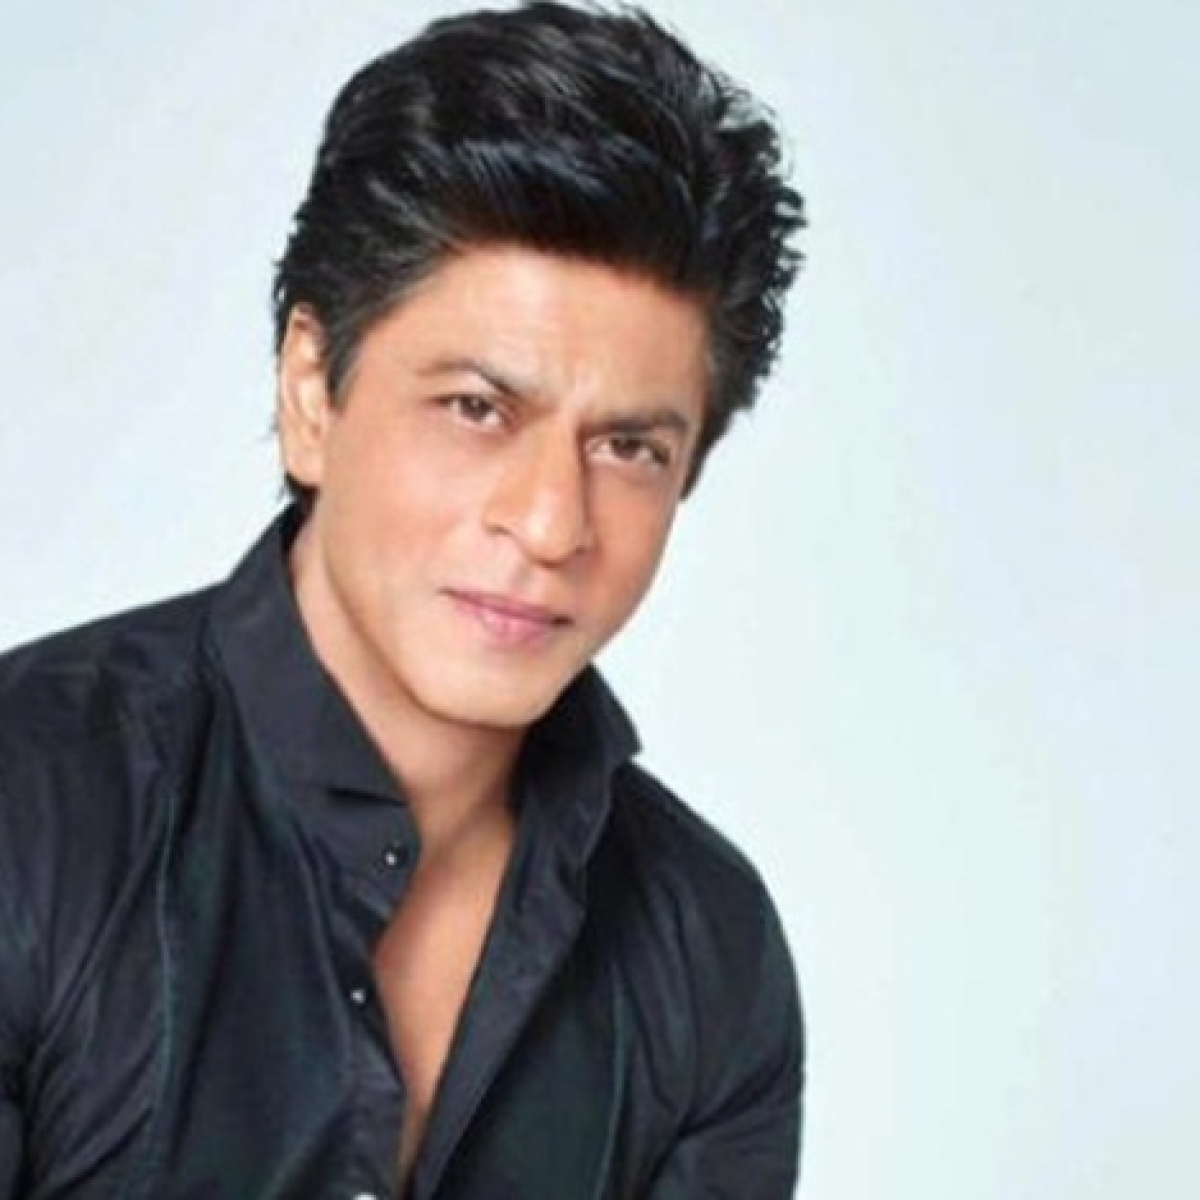 Shah Rukh Khan green lights Rajkumar Hirani's next?